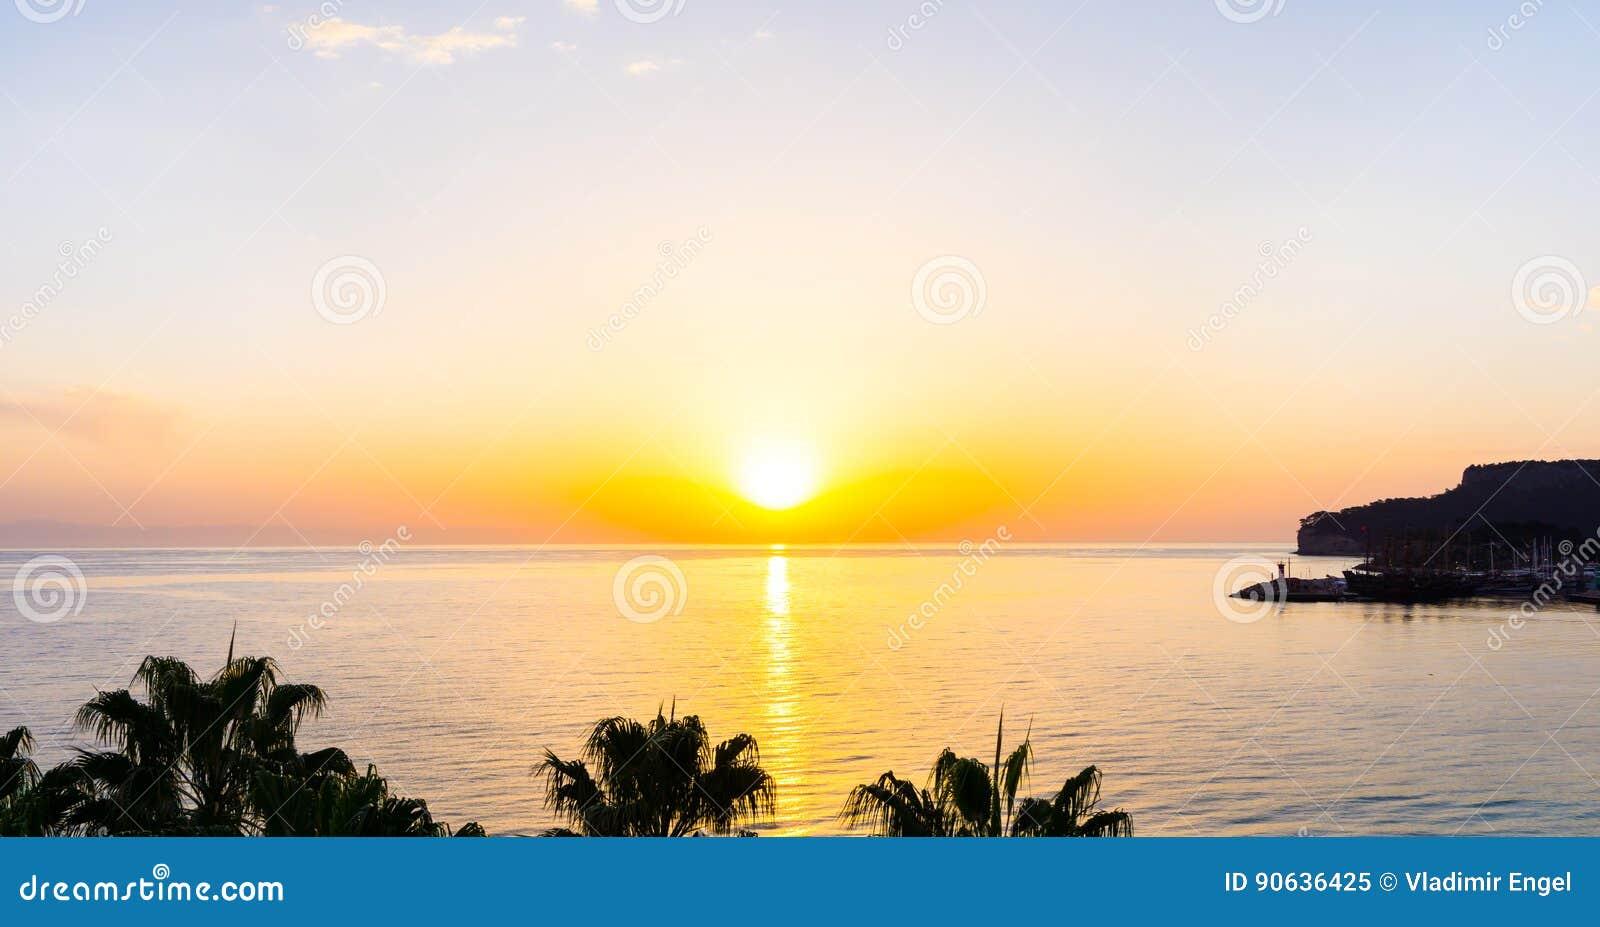 Sunset On The Sea Sunrise Wallpaper Stock Image Image Of Tree